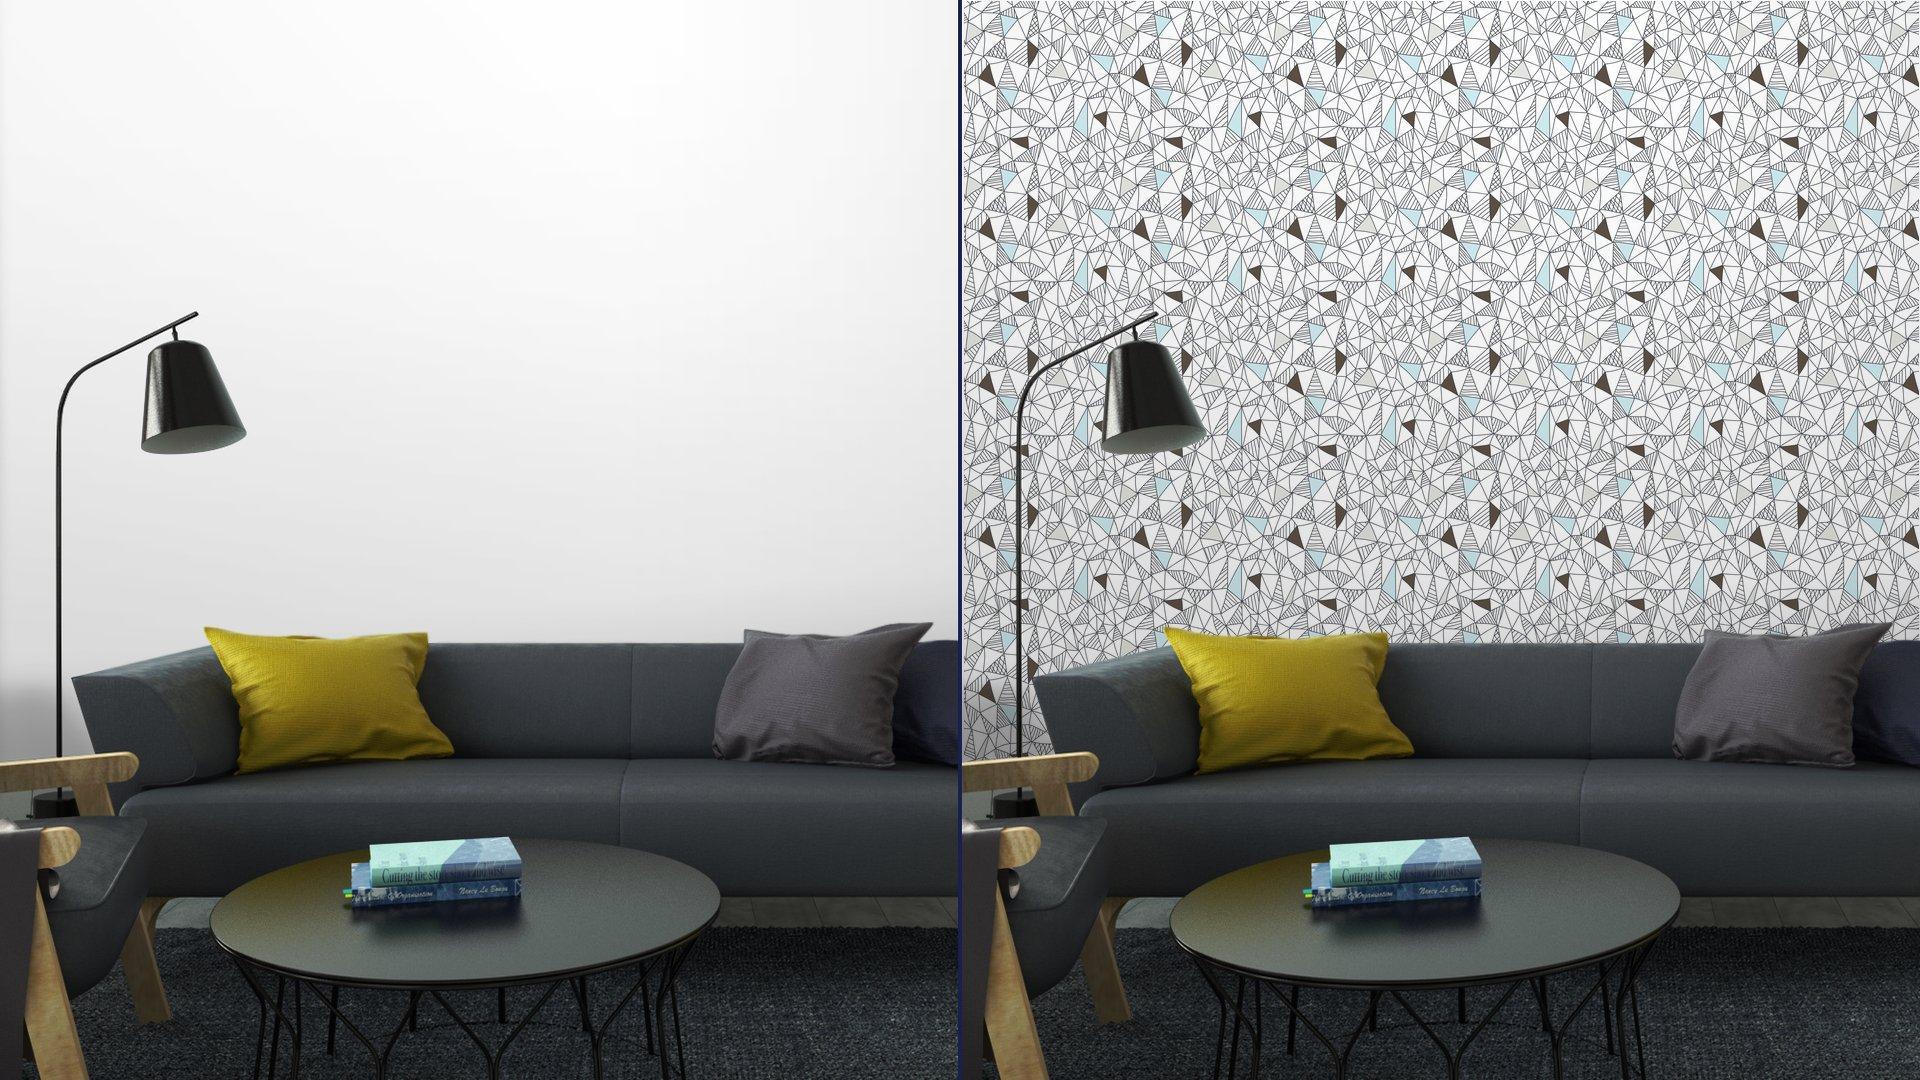 Fotomurales mexico papeles pintados patron abstracto sin fisuras garabato 5 - Papel Tapiz Patrón Geométrico Abstracto Estilo Garabato 01